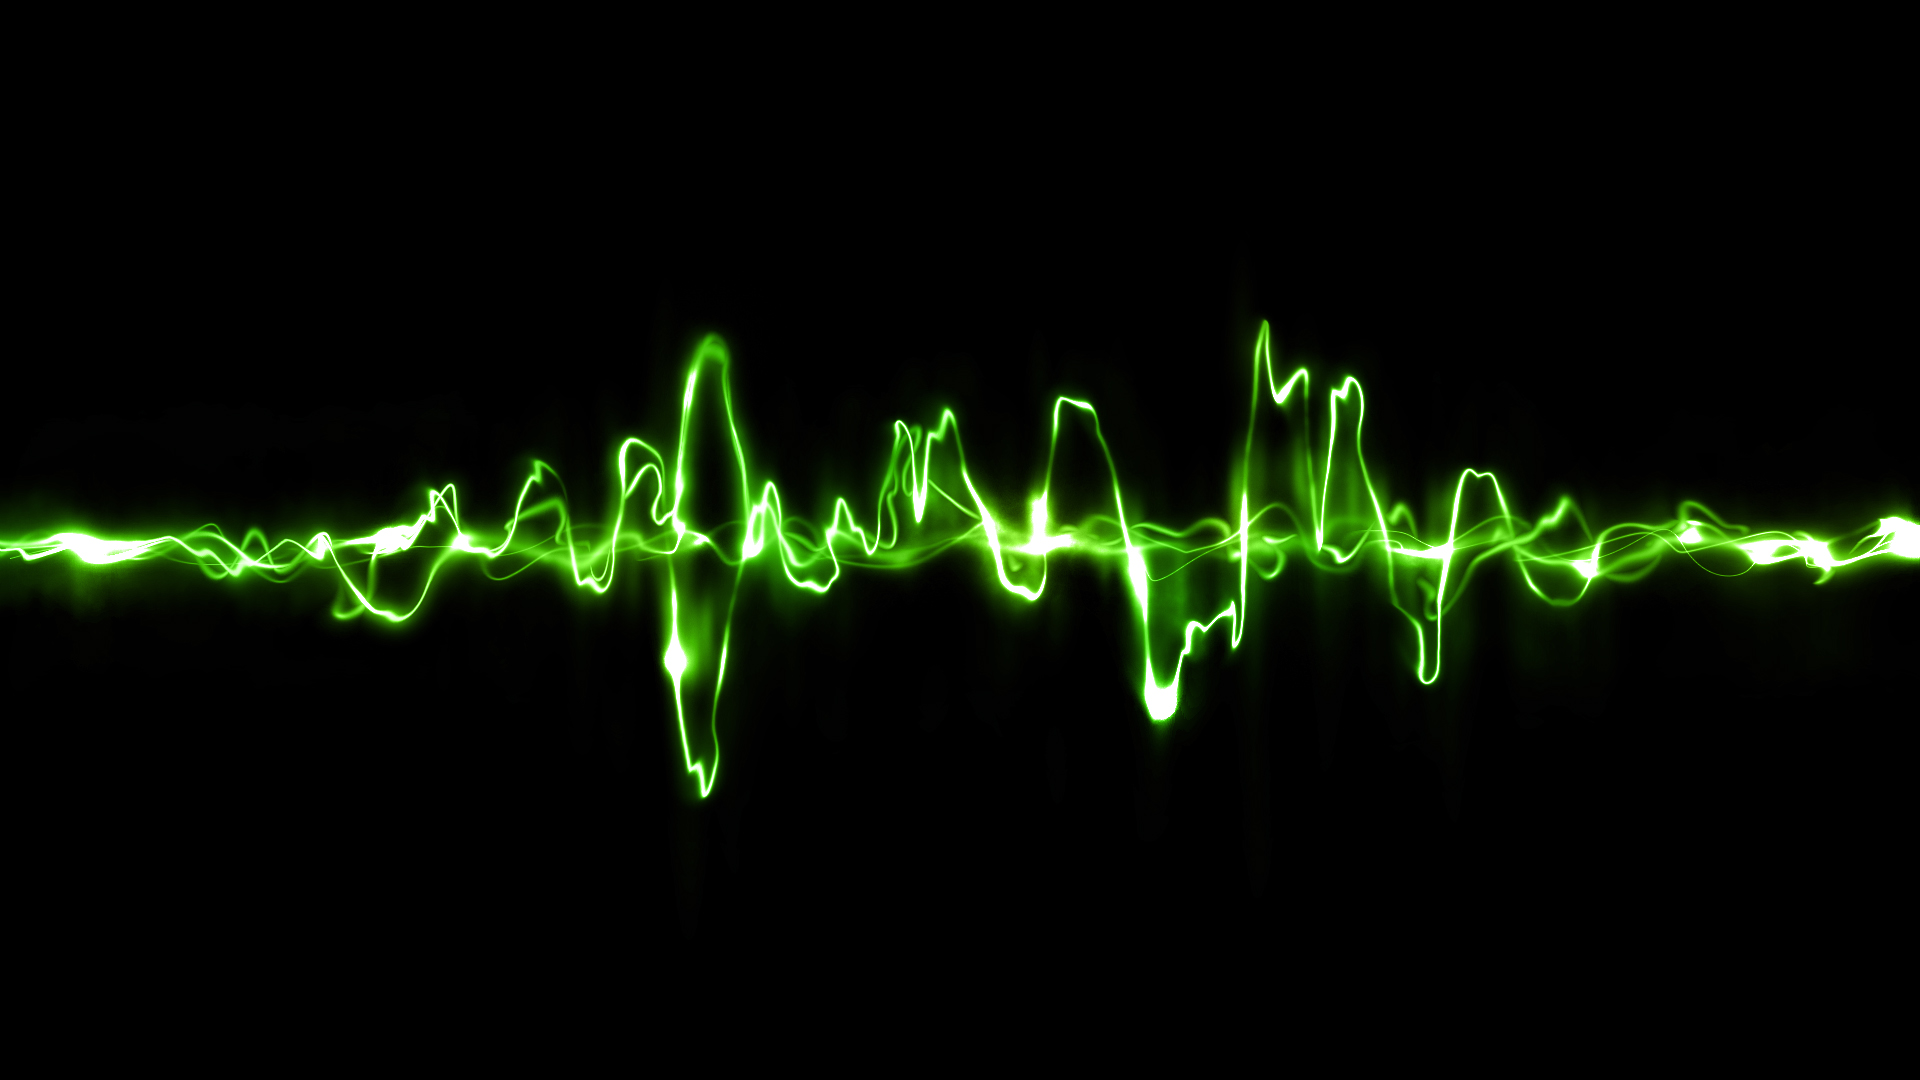 Ibm Speech Recognition System Beats Microsoft S Less Than